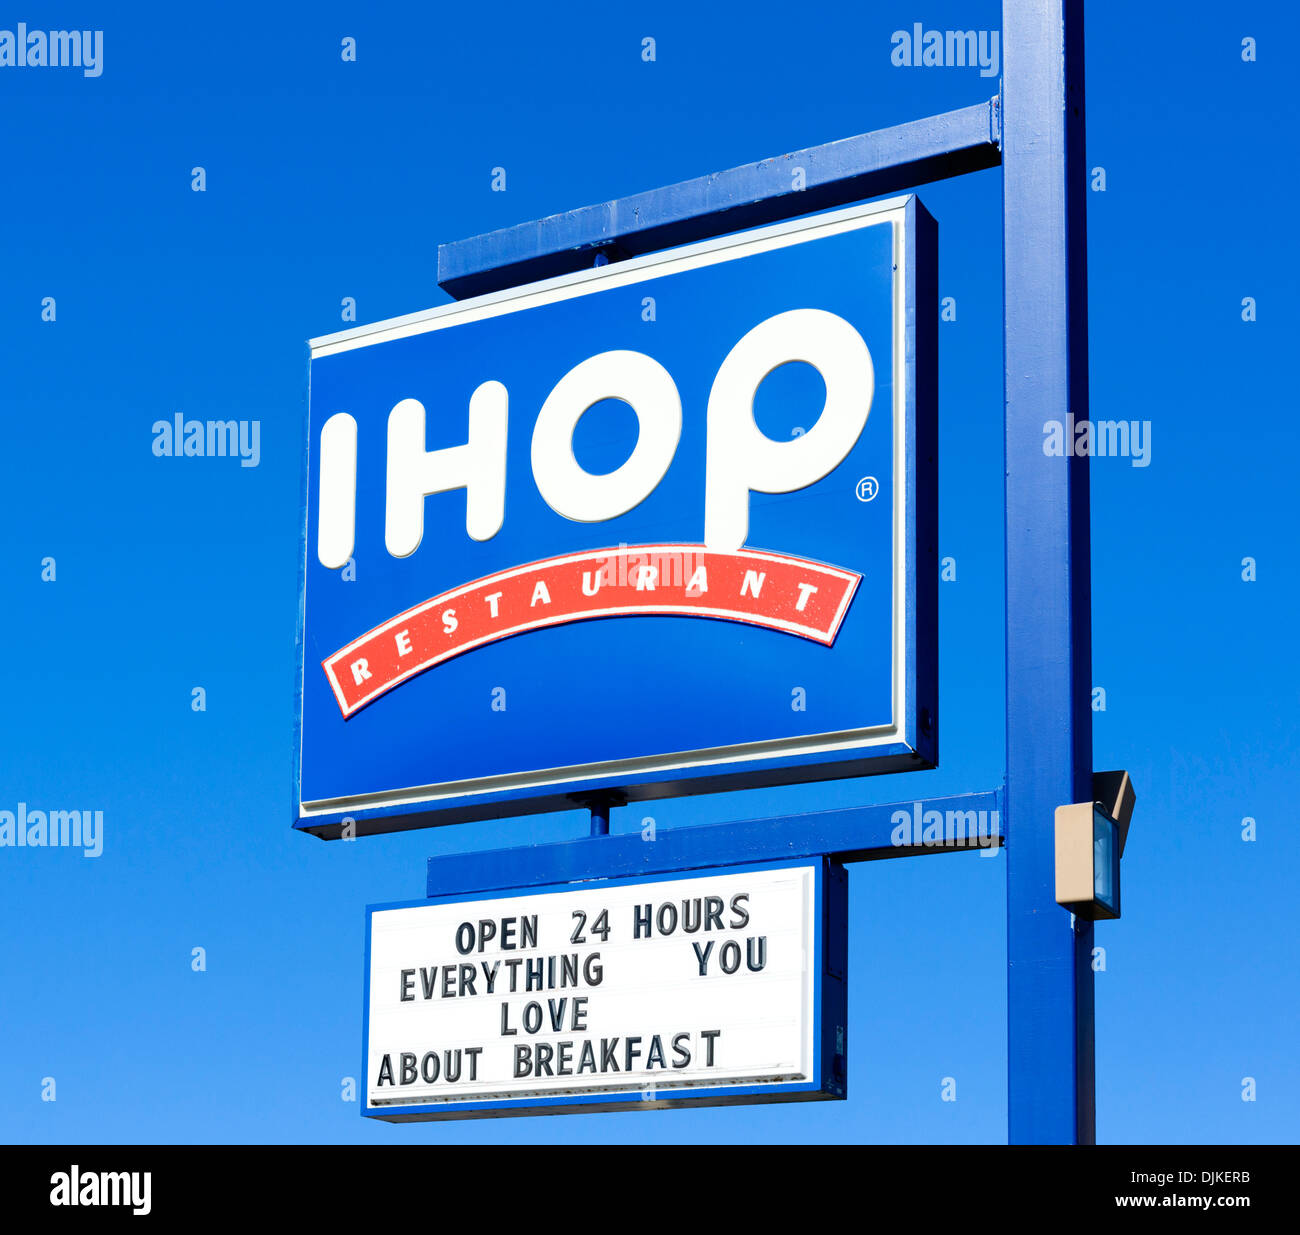 Ihop Restaurant Sign, Central Florida, Usa Stock Photo, Royalty ...